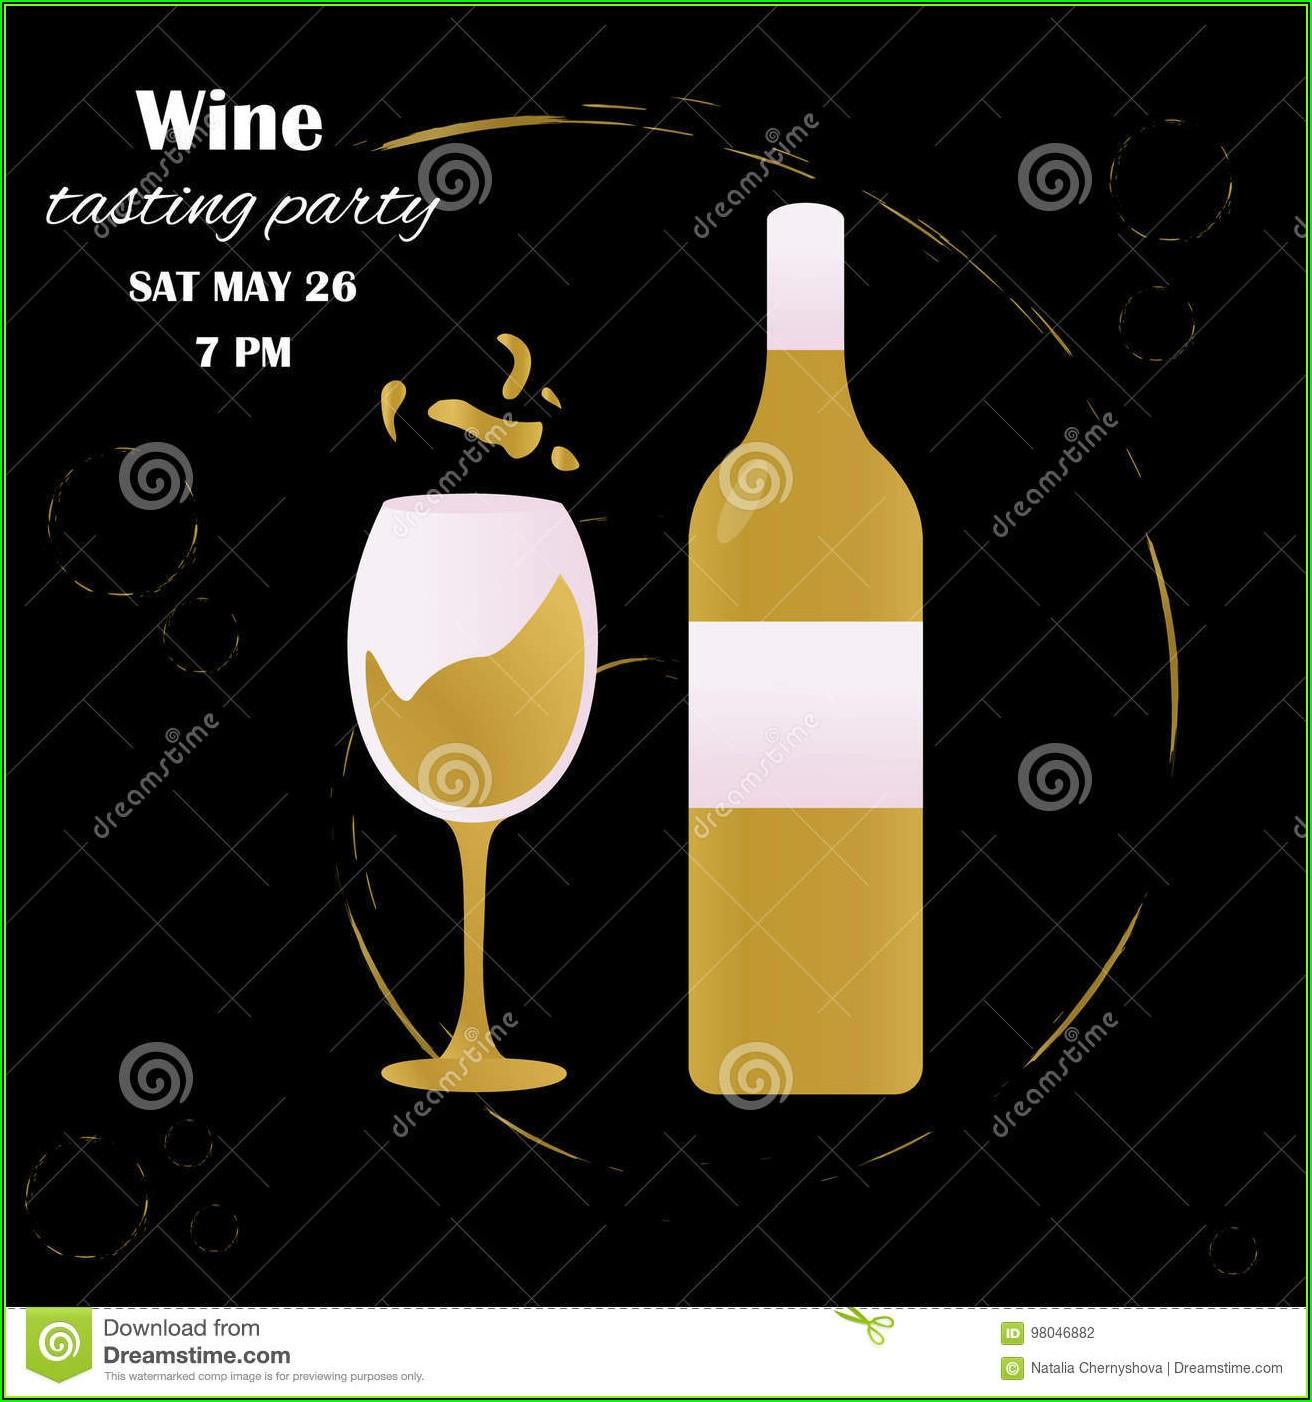 Wine Tasting Party Invitation Template